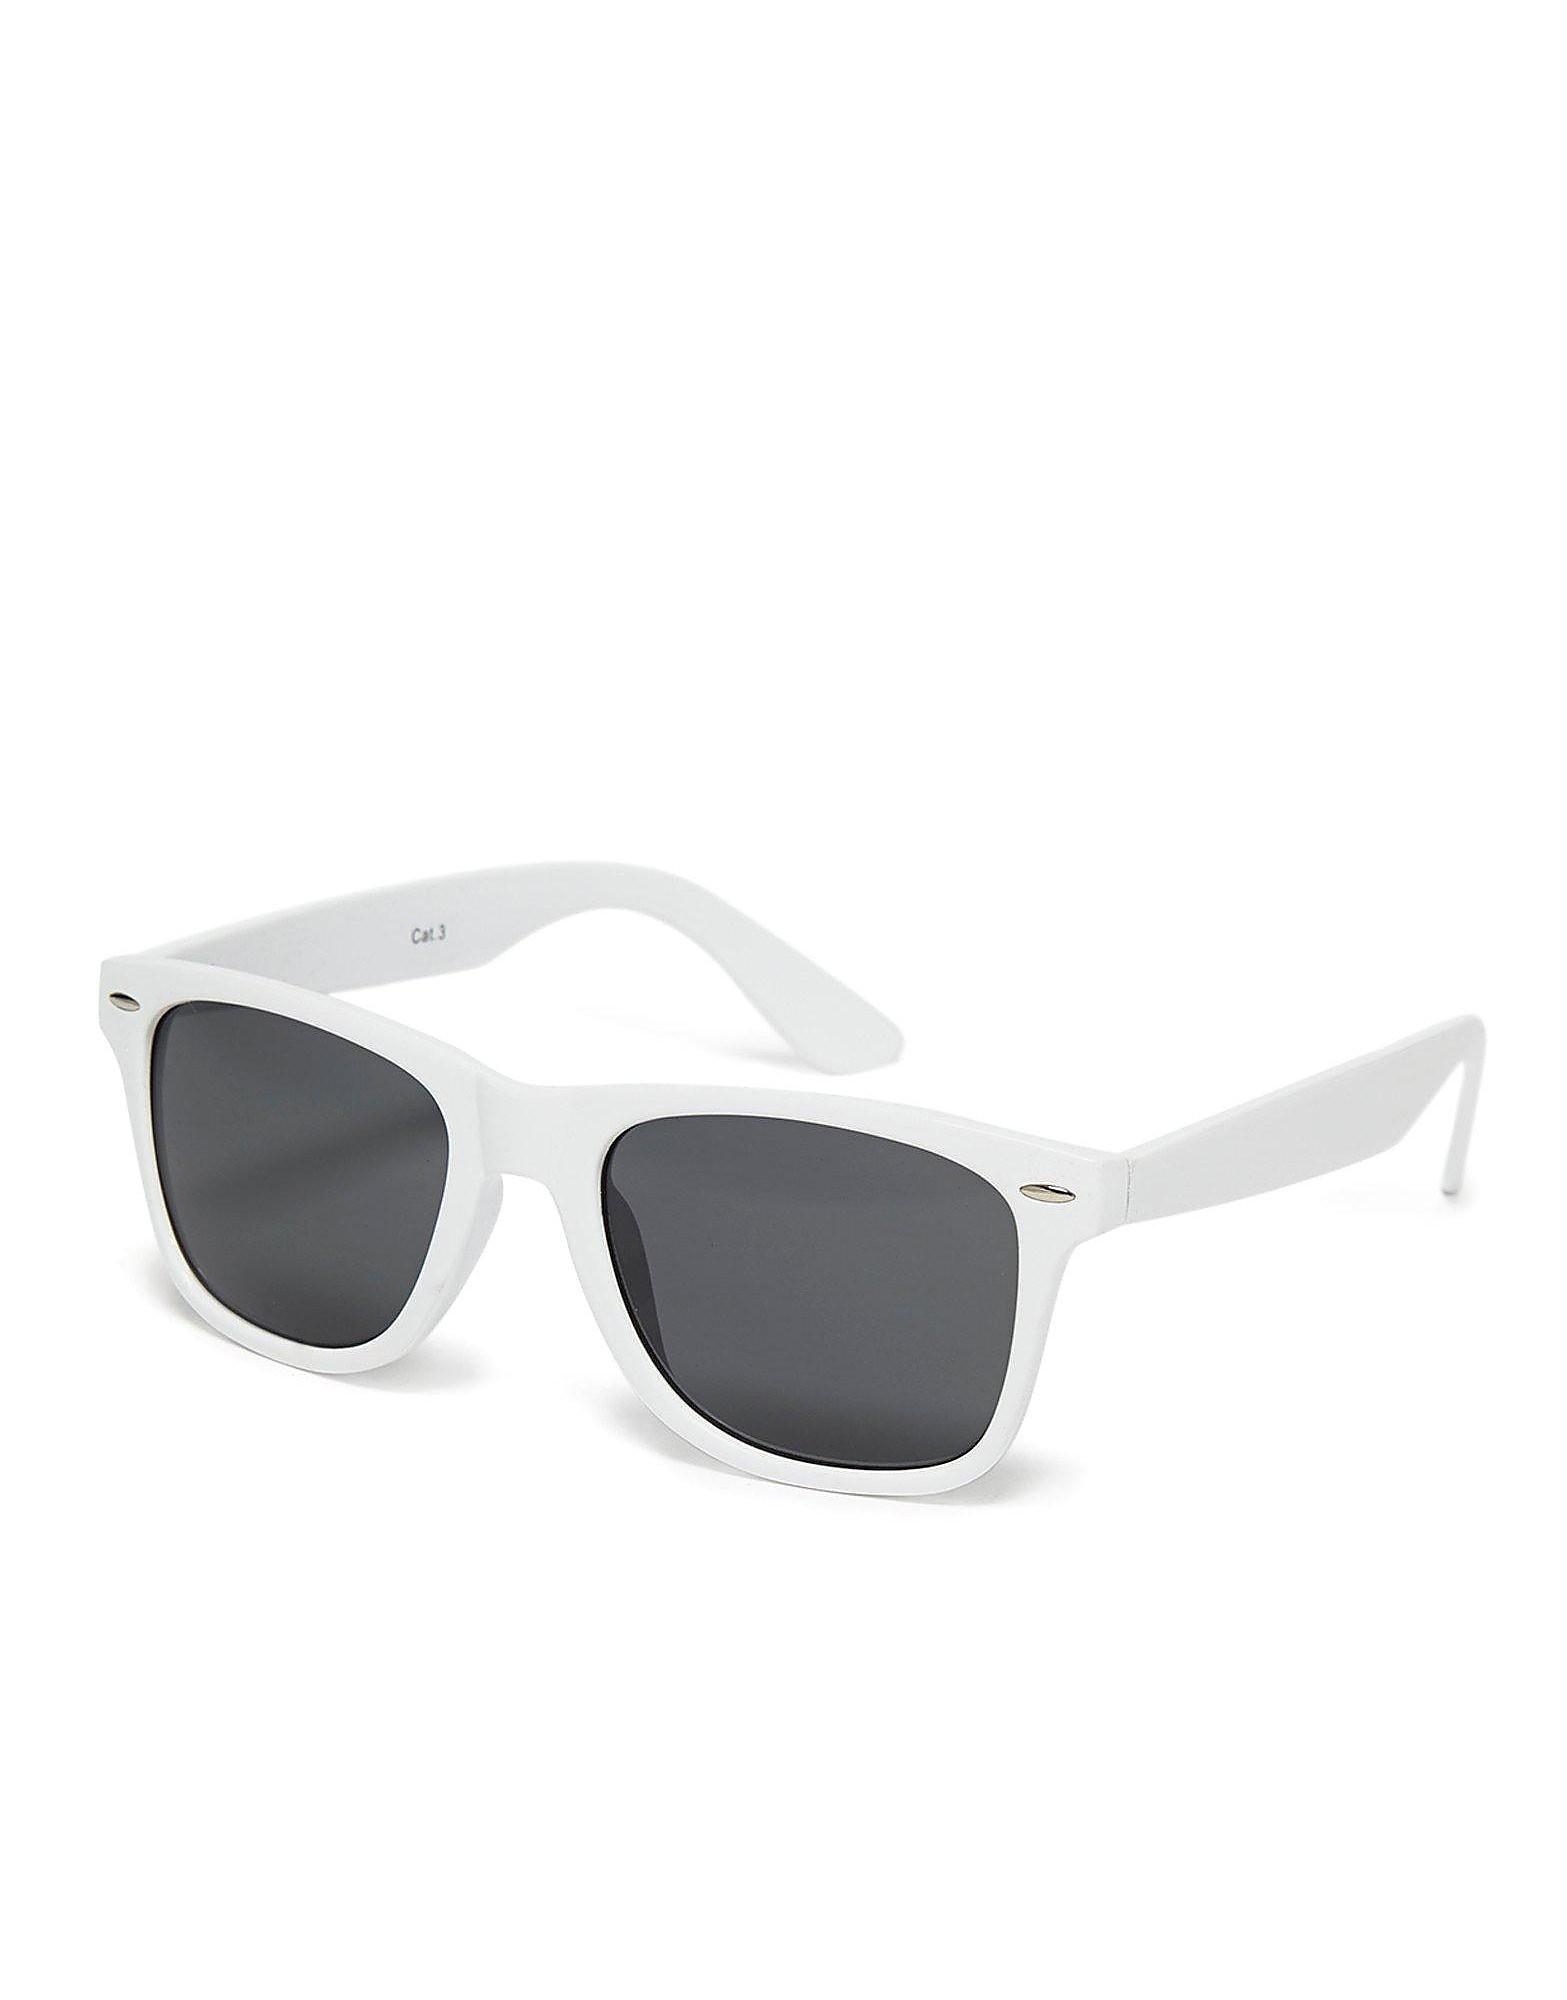 Brookhaven Caton Sunglasses